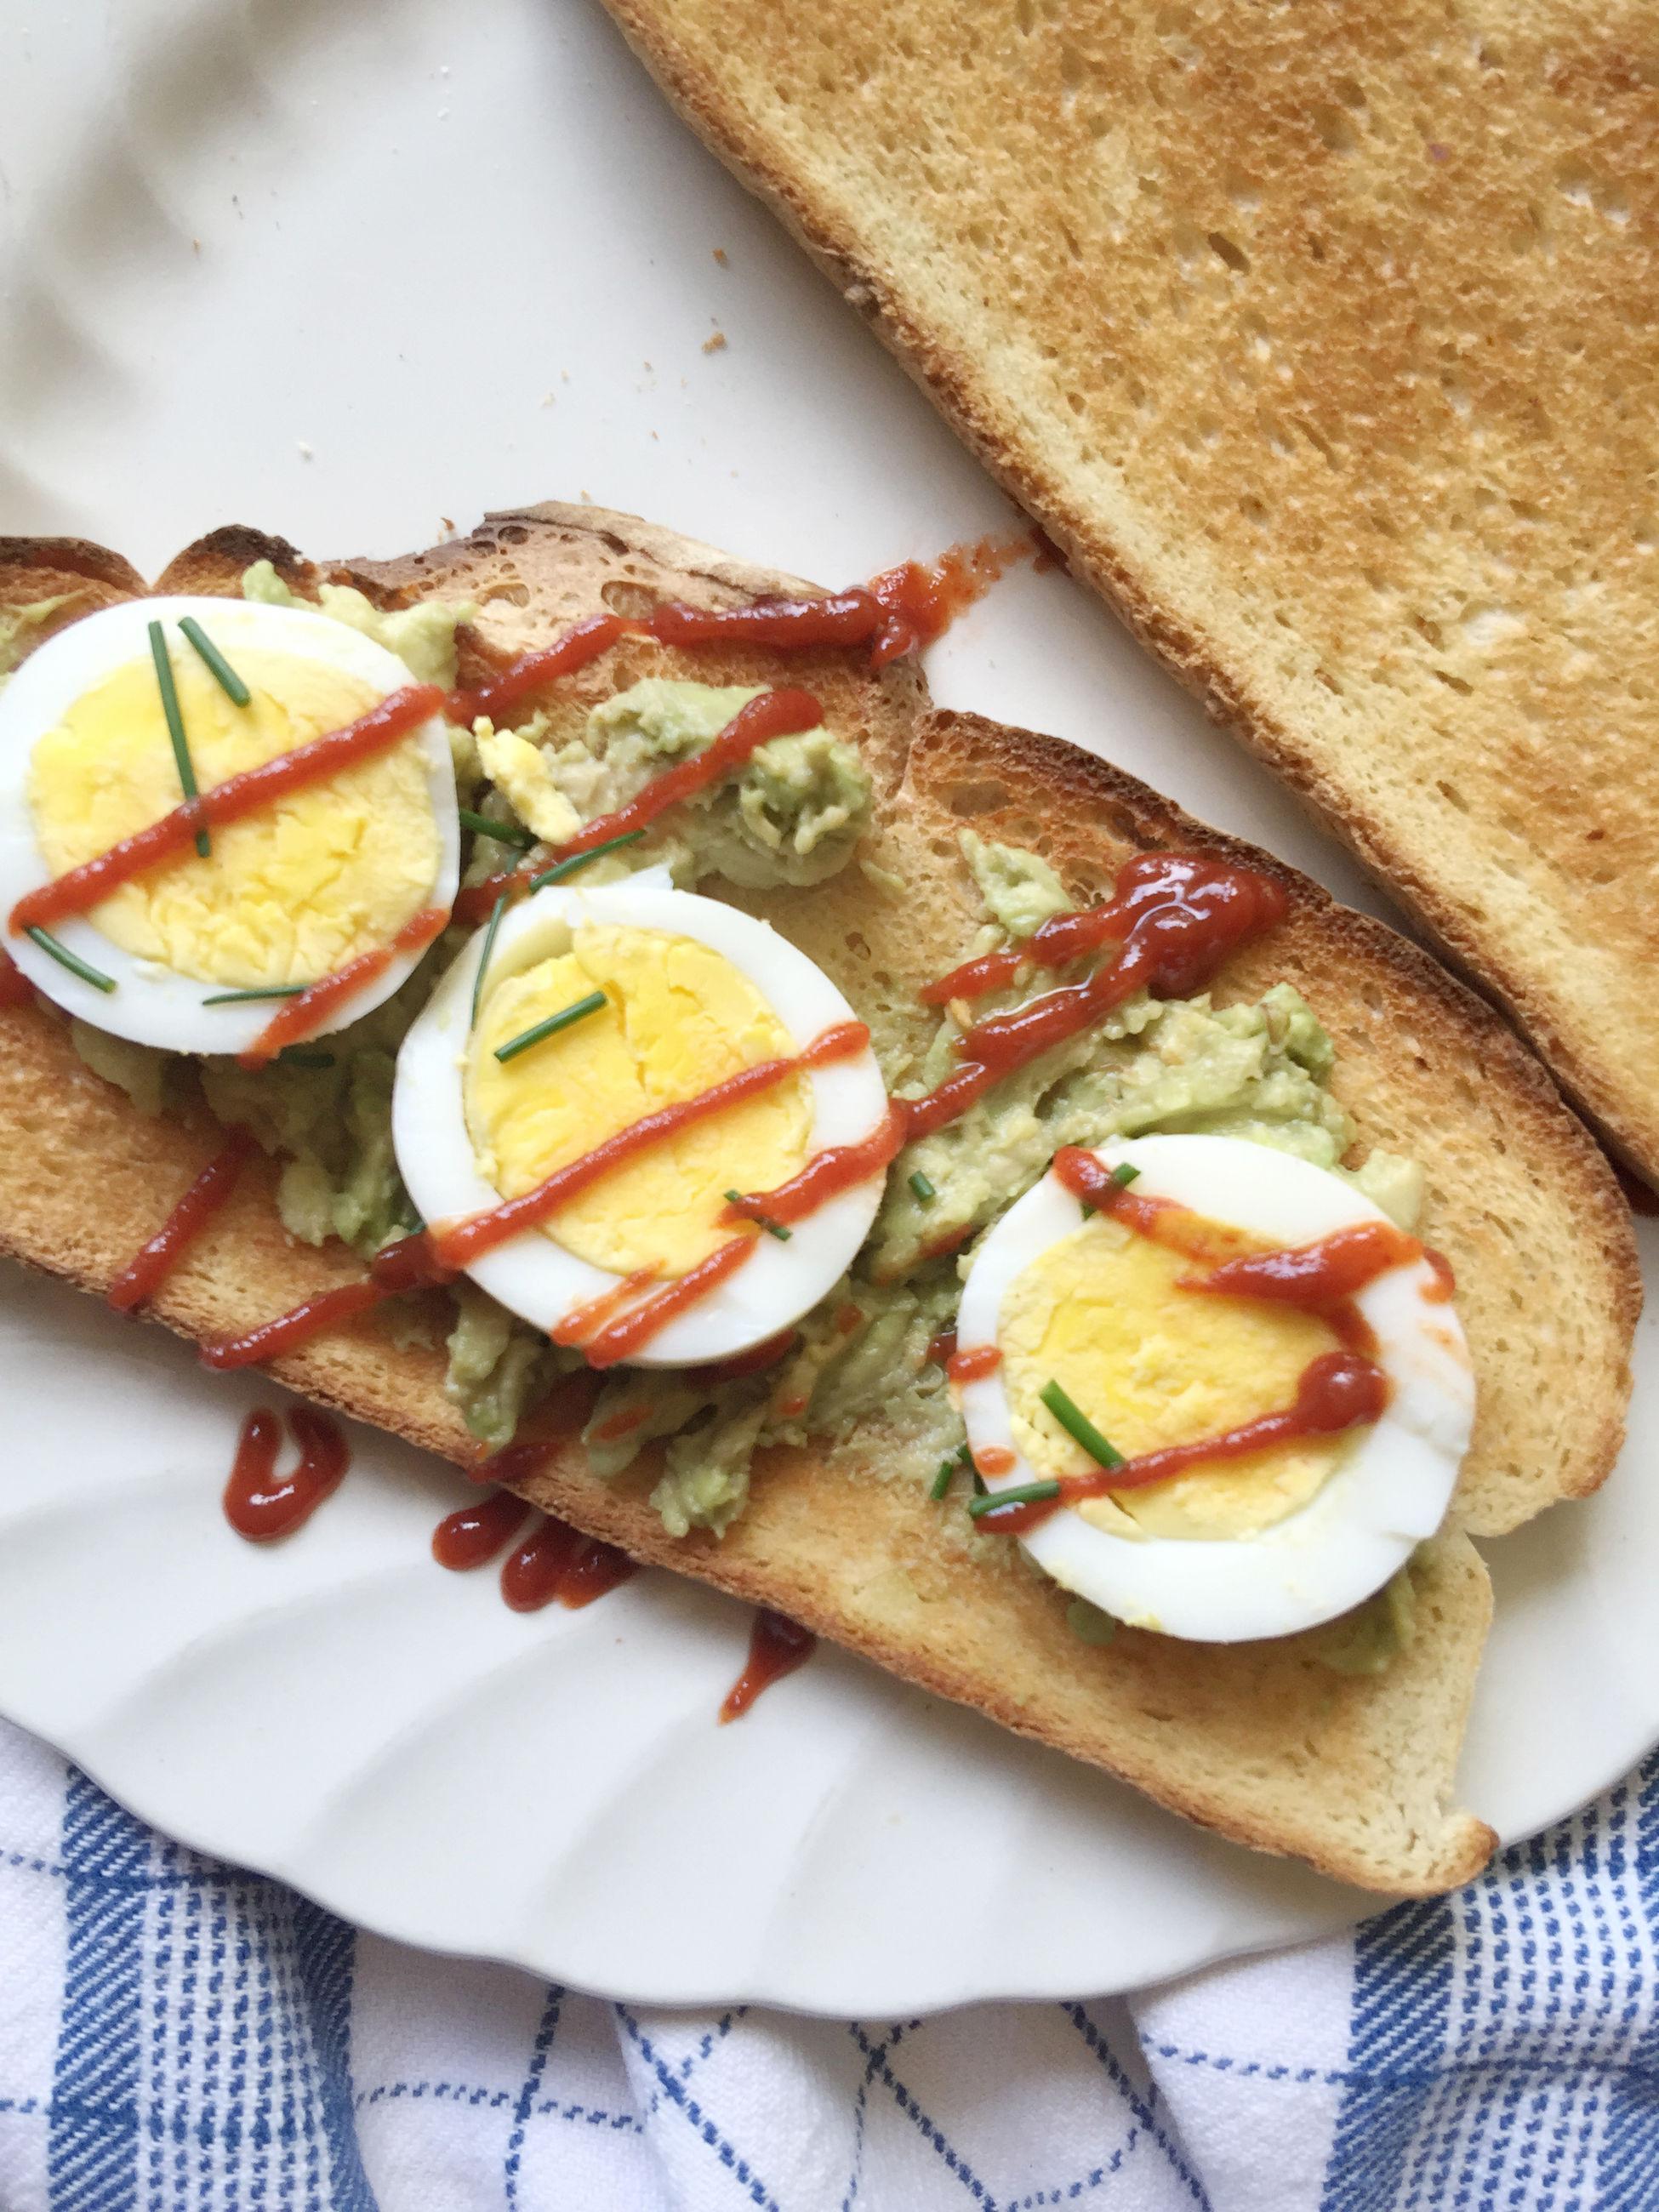 High angle view of avocado and egg sandwich